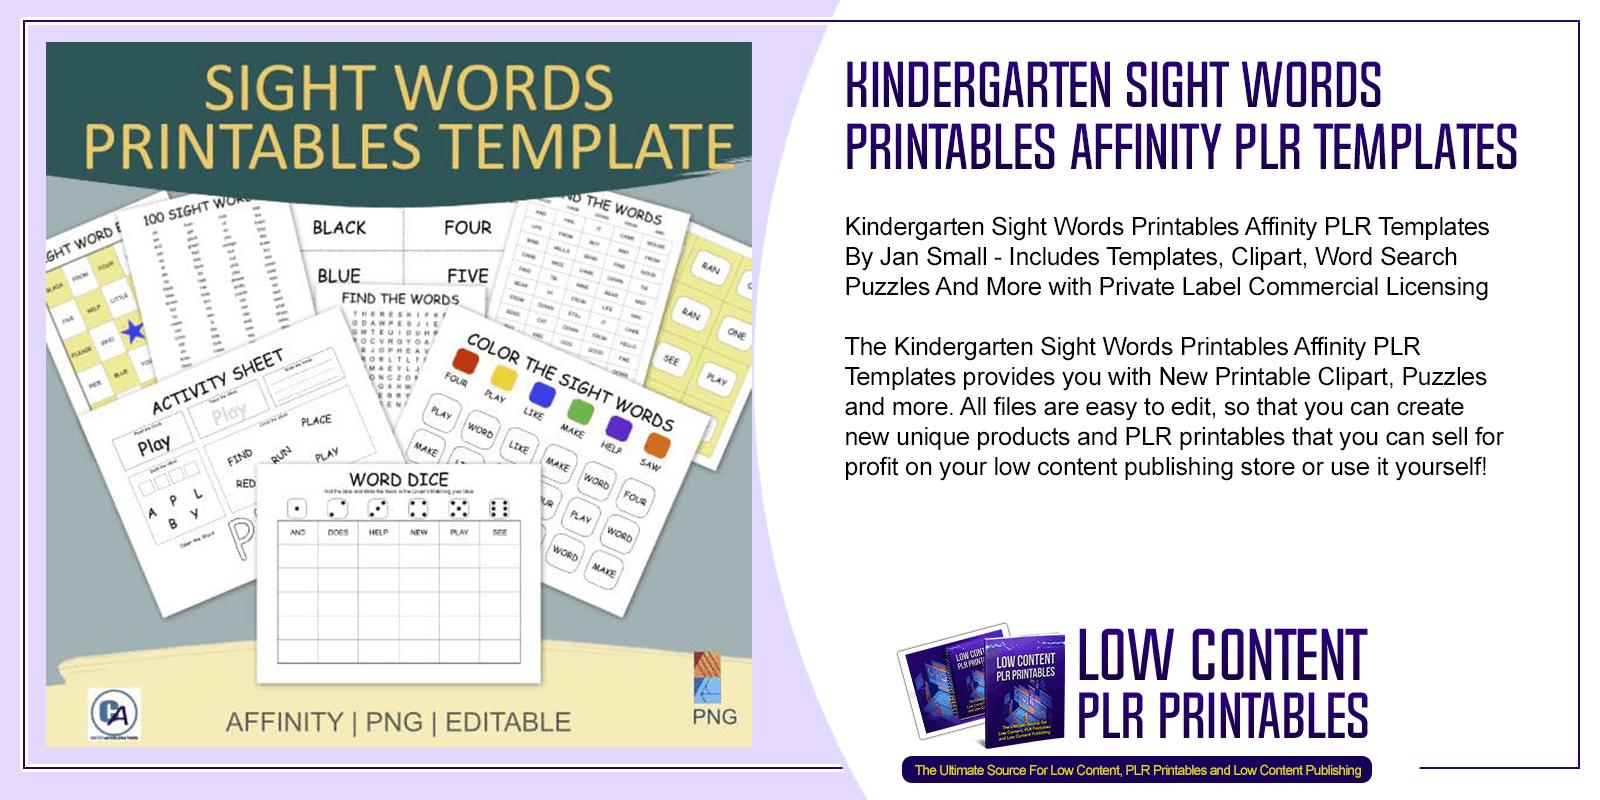 Kindergarten Sight Words Printables Affinity PLR Templates